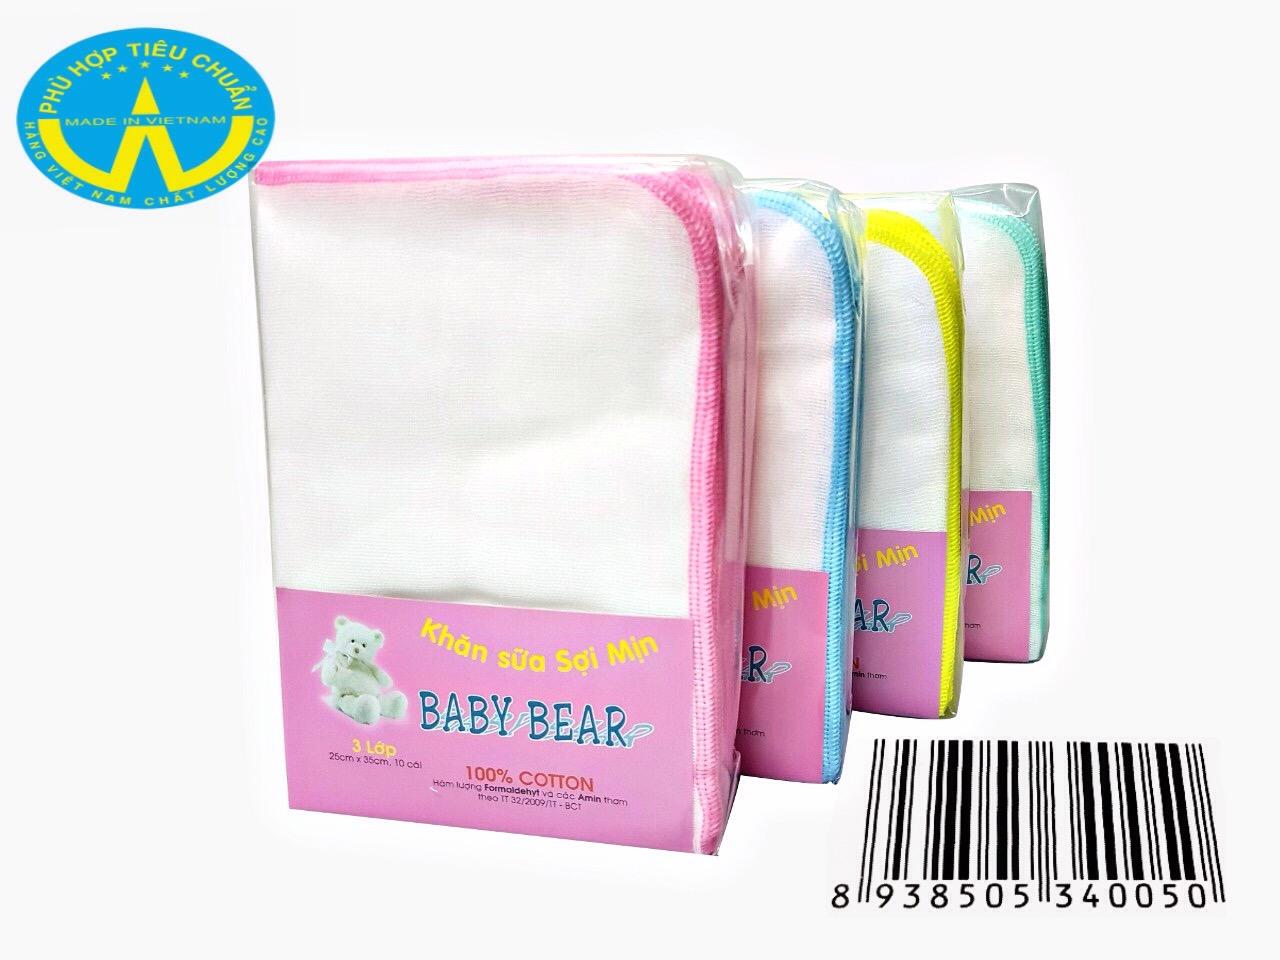 khăn sữa sợi mịn Baby Bear 3 Lớp 10 cái 25 cm x 35 cm